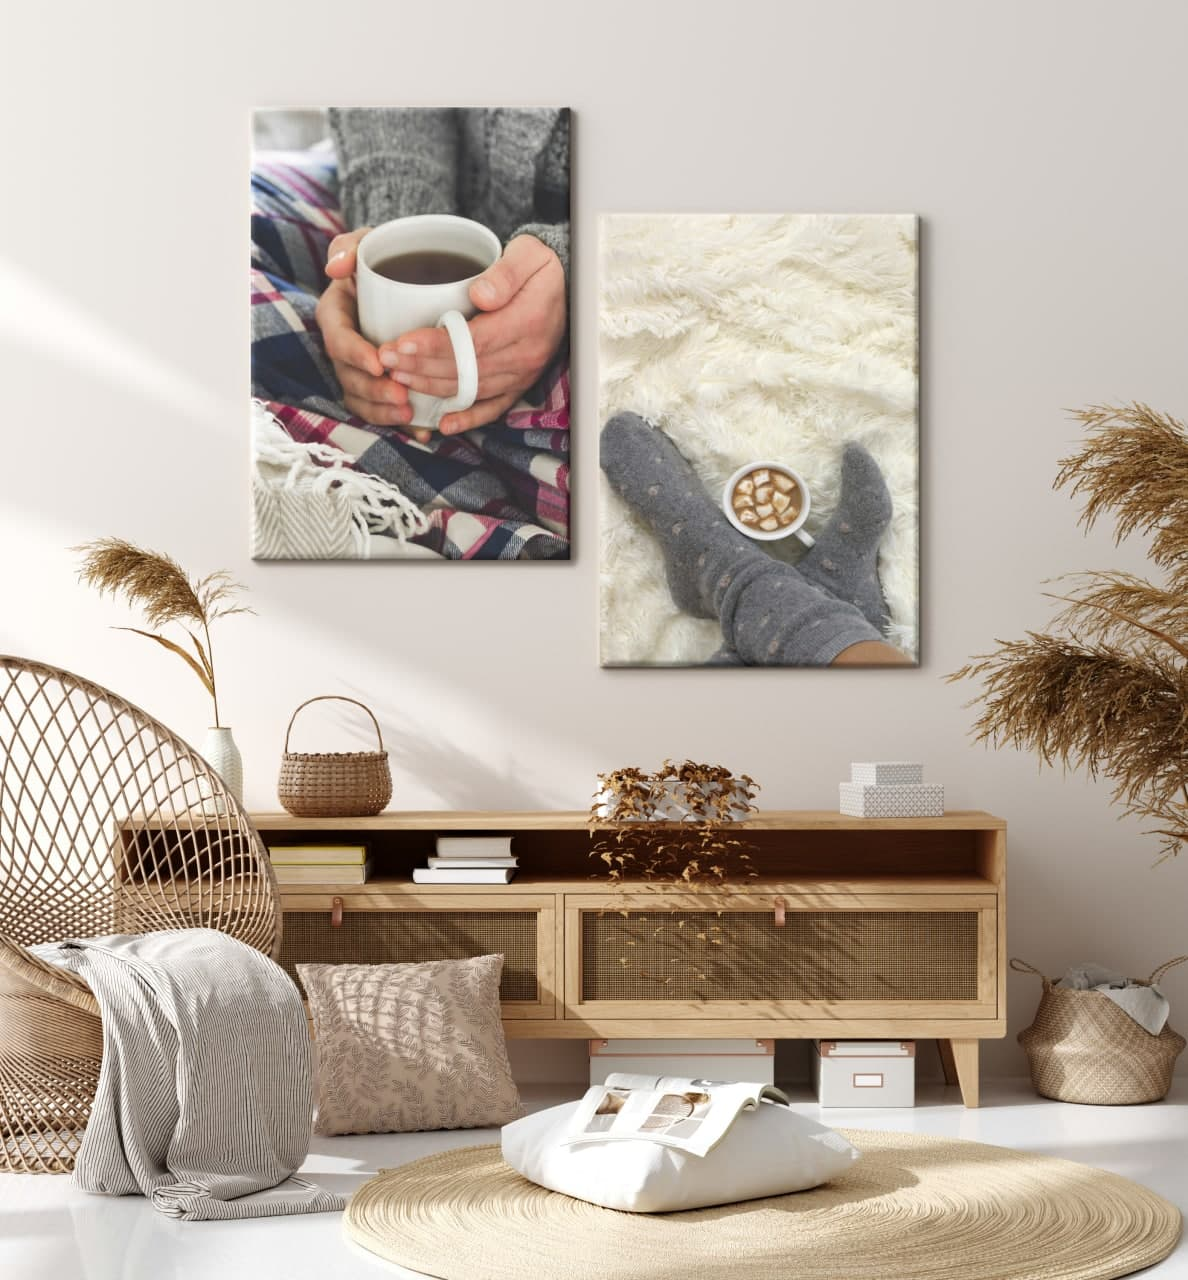 Create Multi Print Wall Displays